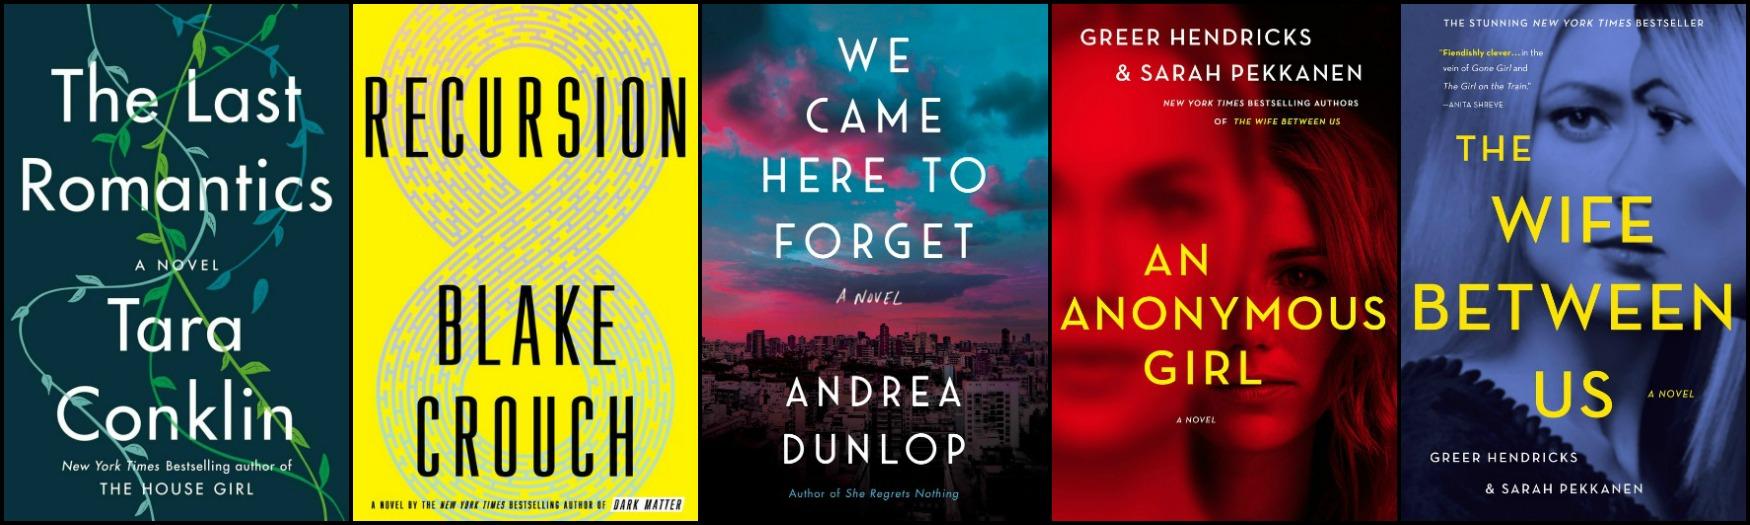 Novel Visits' Favorite New-to-Me Authors from 2019 - Tara Conklin, Blake Crouch, Andrea Dunlop, and Greer Hendricks & Sarah Pekkanen